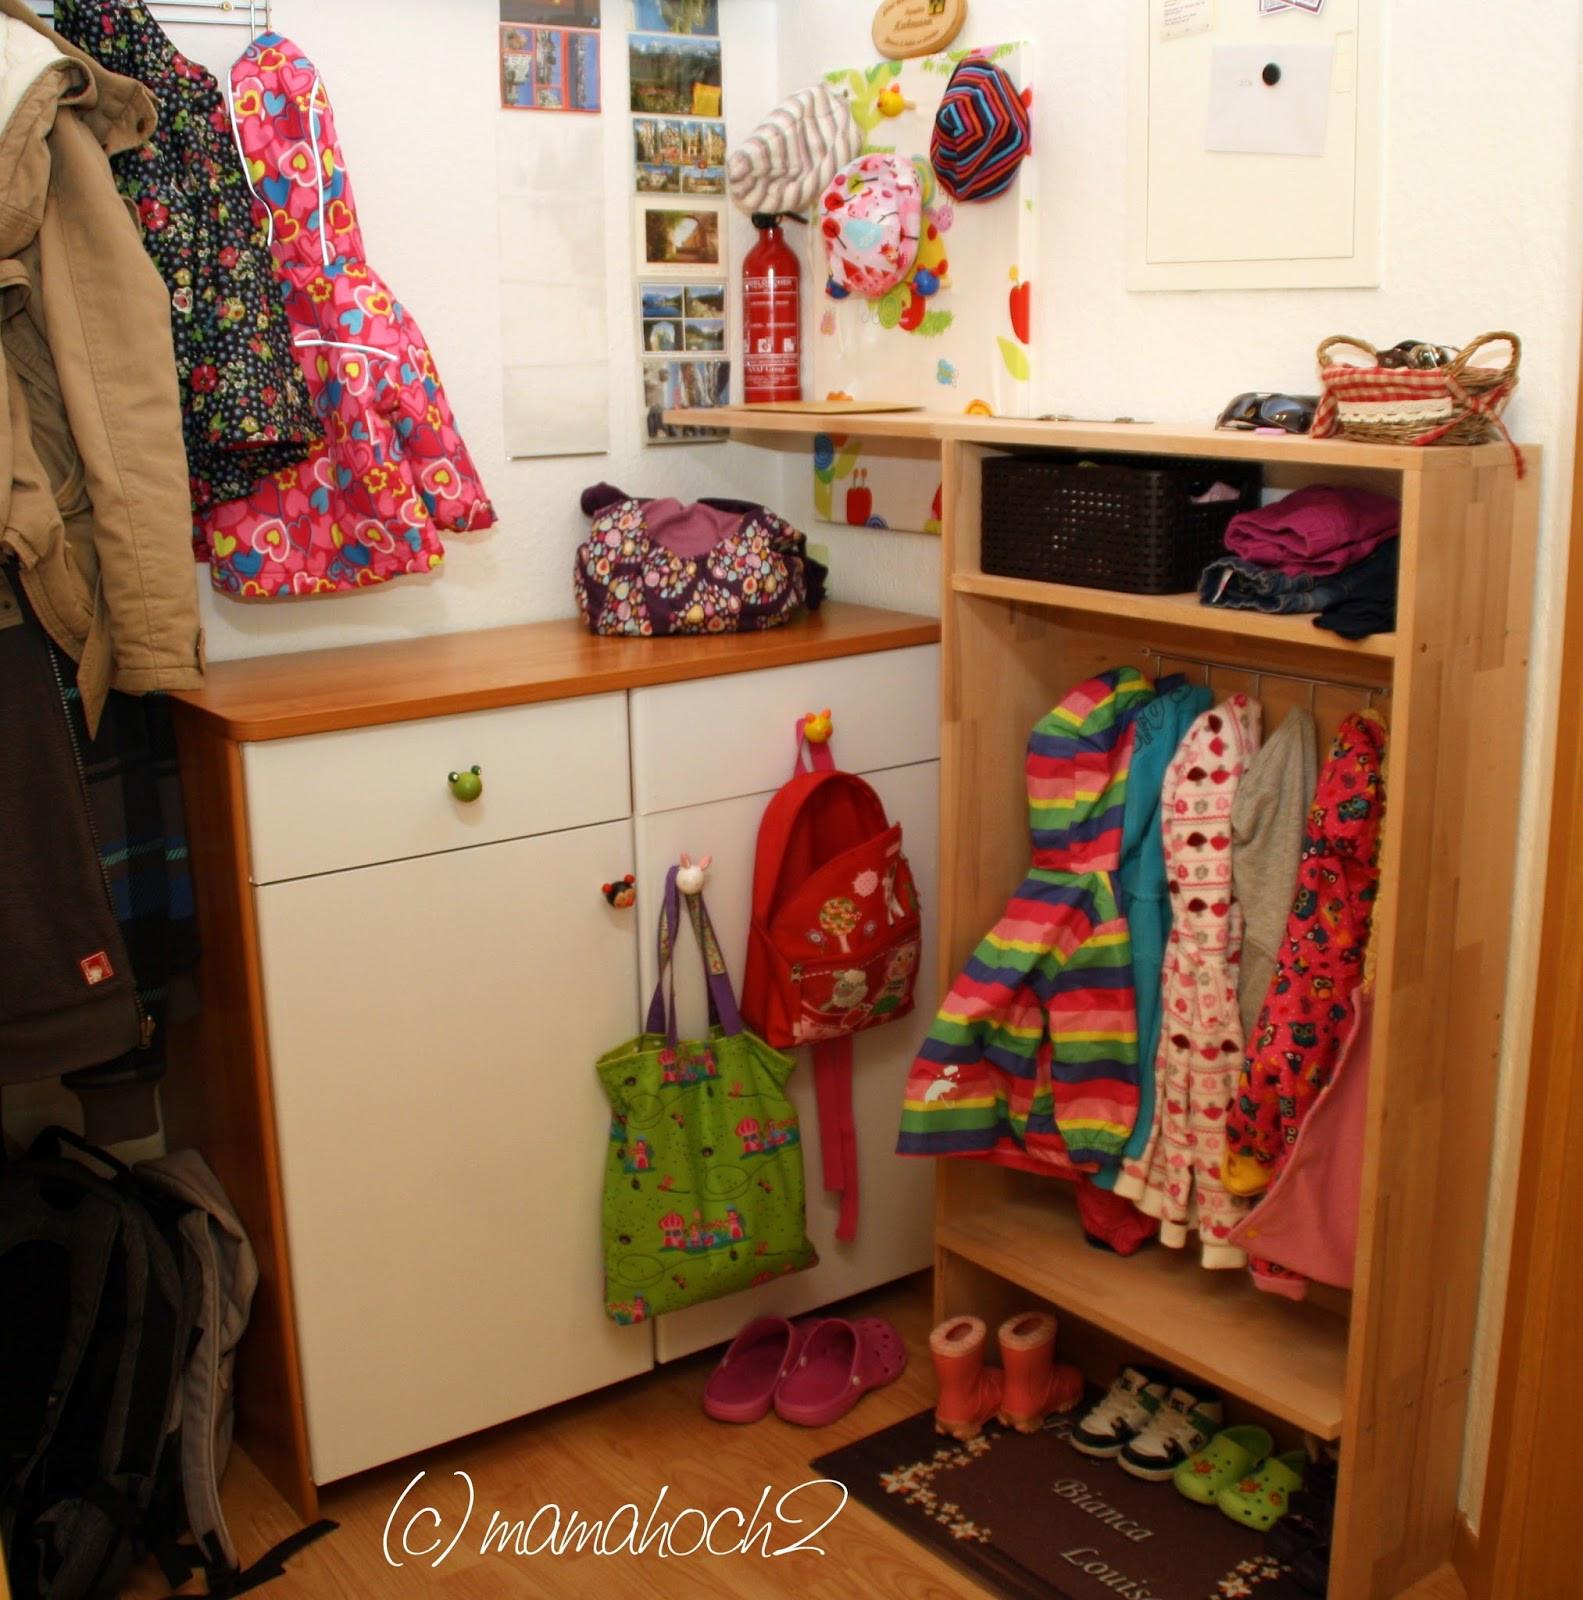 Kindergarderobe Diy  DIY Kindergarderobe ⋆ Mamahoch2